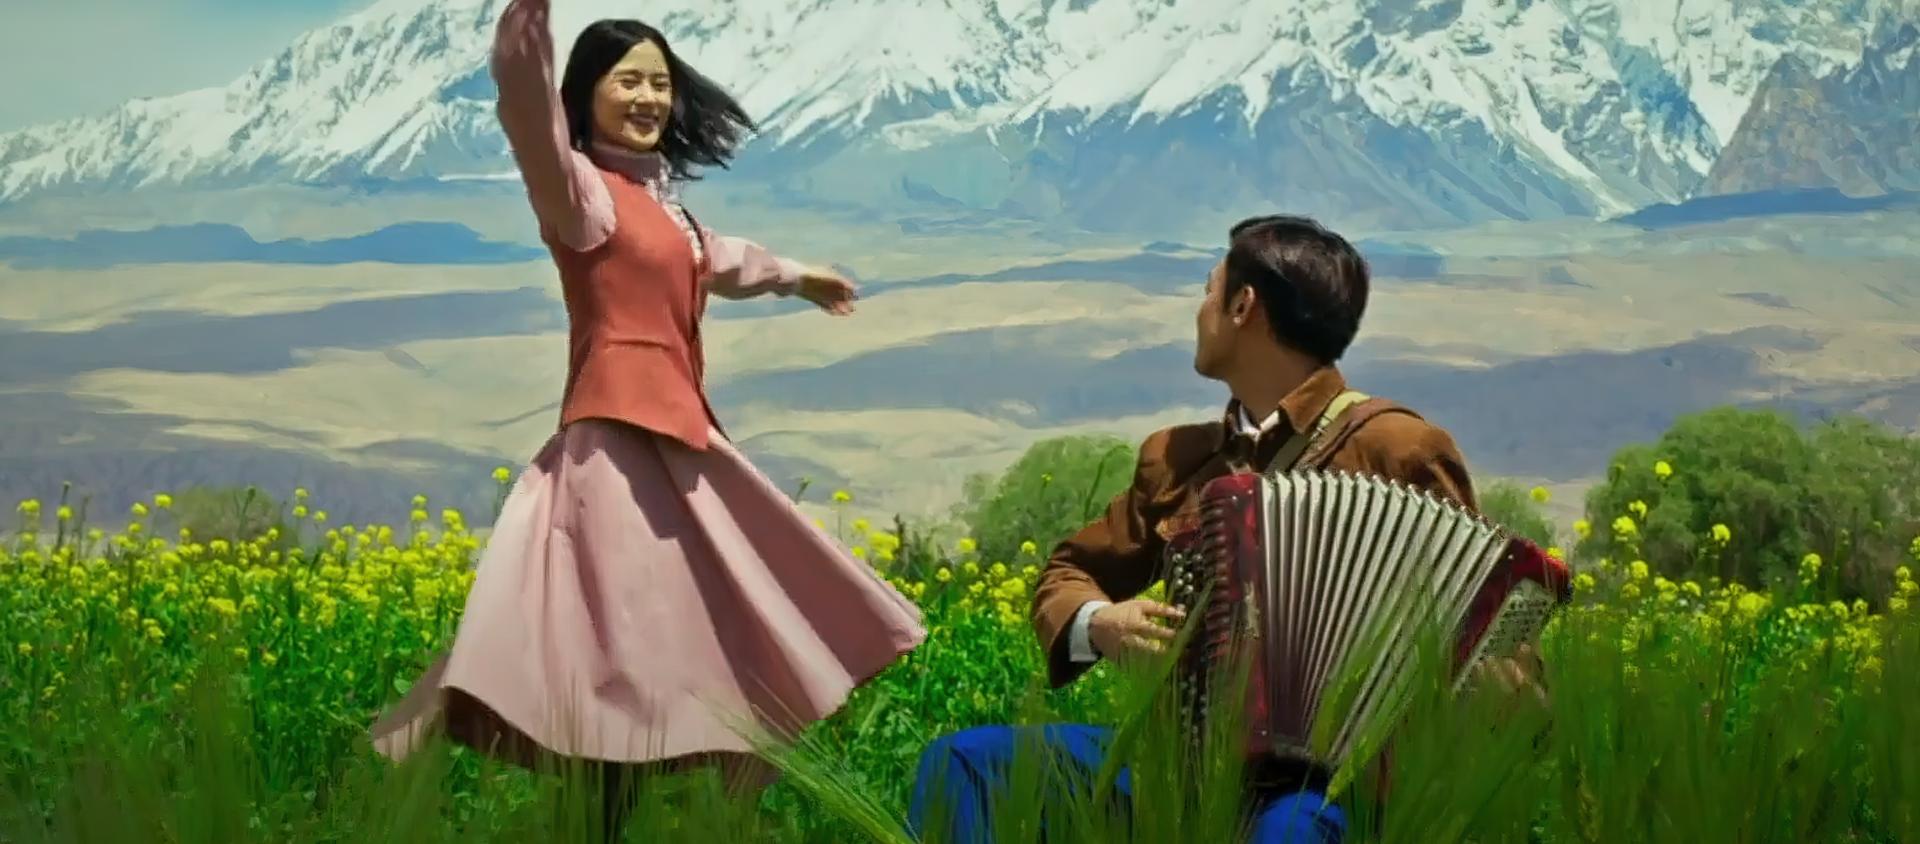 Immagine del film promozionale cinese The Wings of Songs - Sputnik Italia, 1920, 05.04.2021